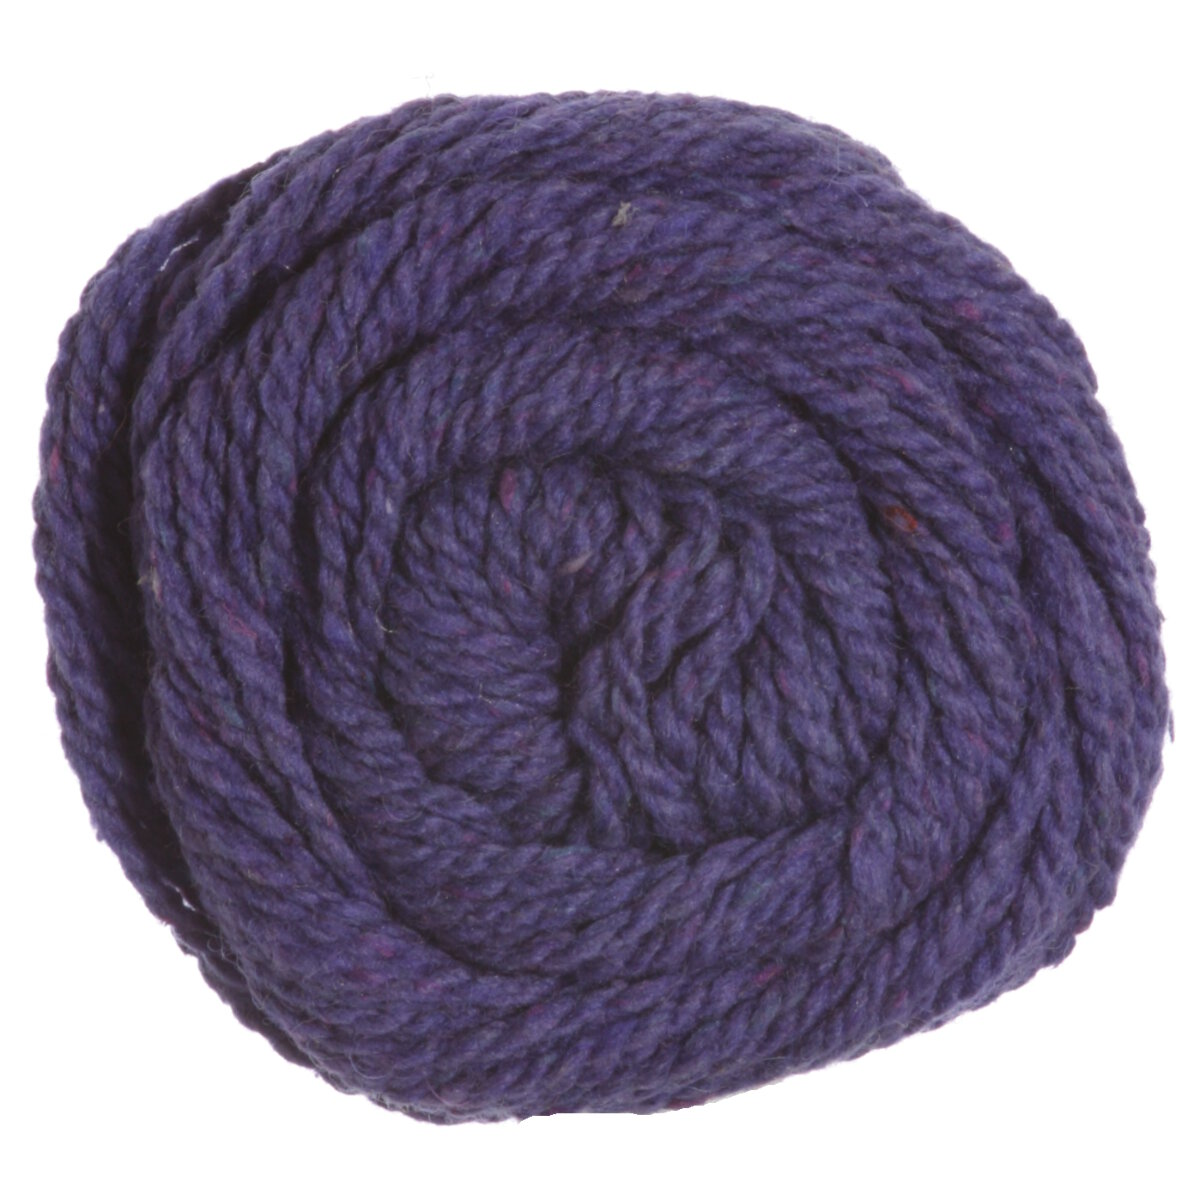 Free Knit Hat Patterns For Women : Cascade Tivoli Yarn - 14 Purple at Jimmy Beans Wool